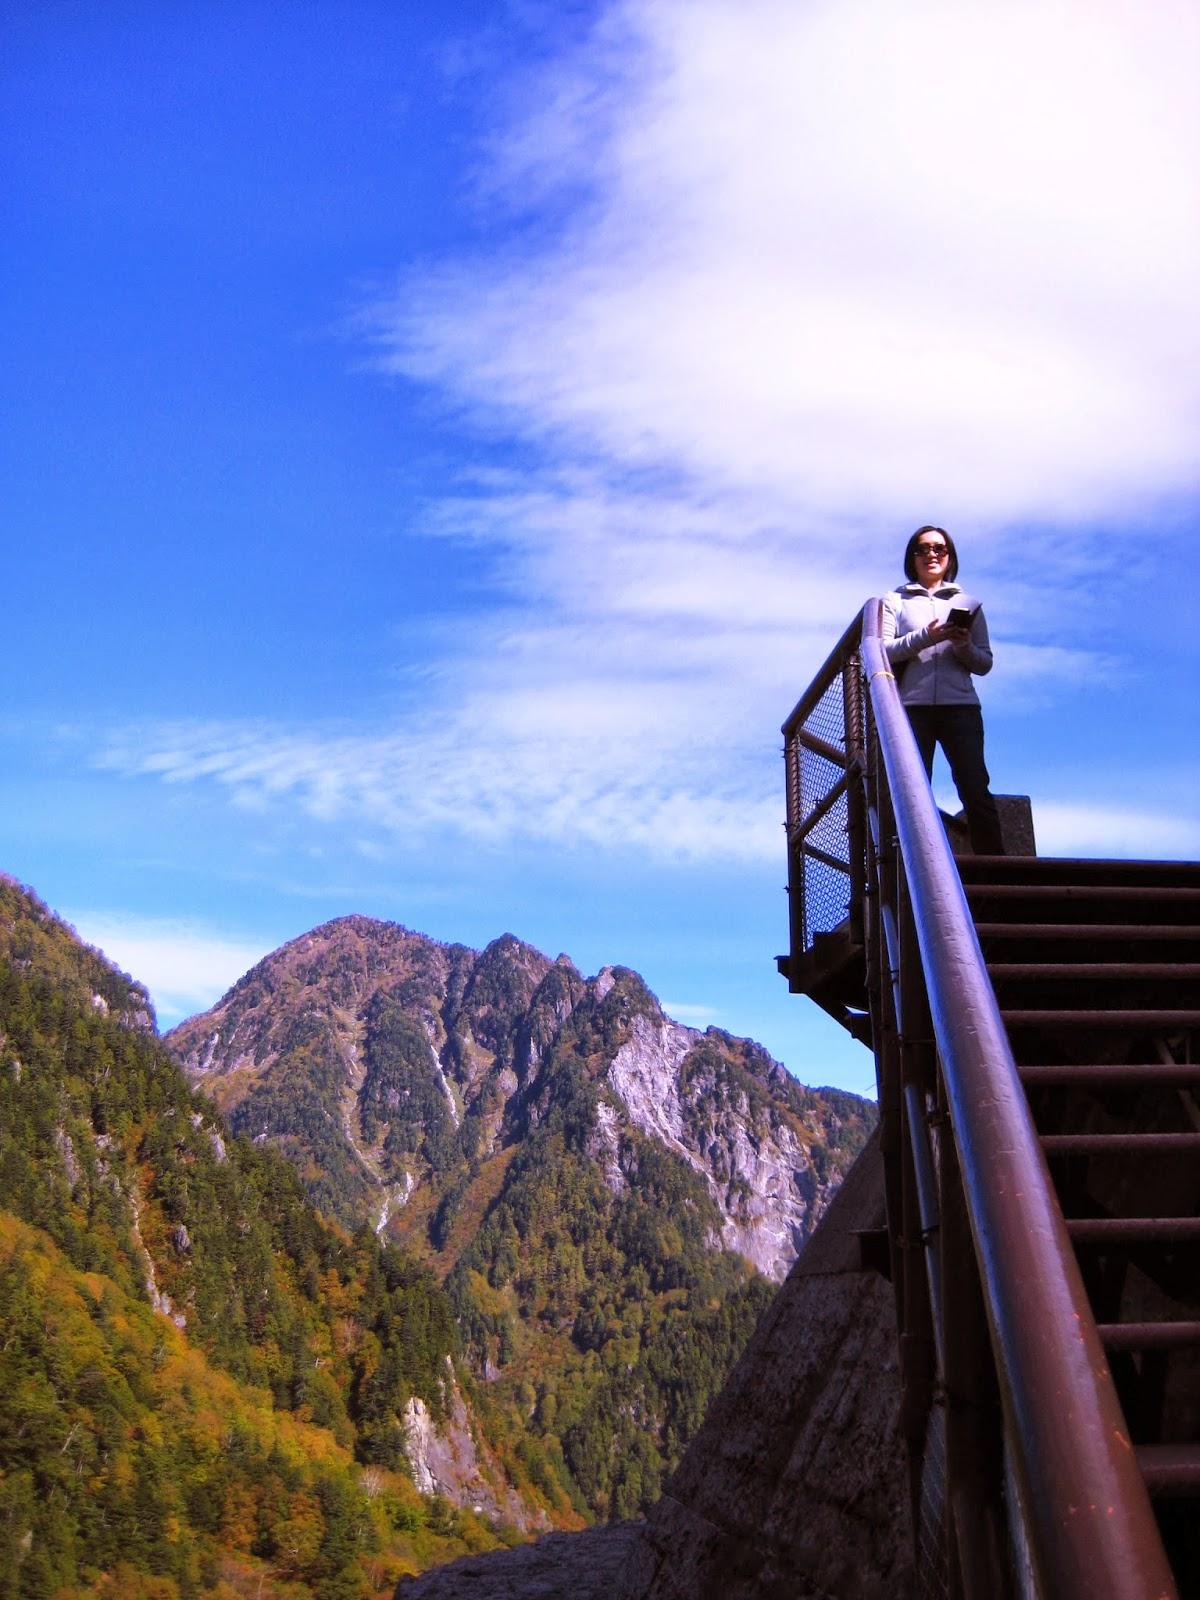 Happy Tours: 日本中部自由行2013-立山黑部(Day 2-2-黑部)